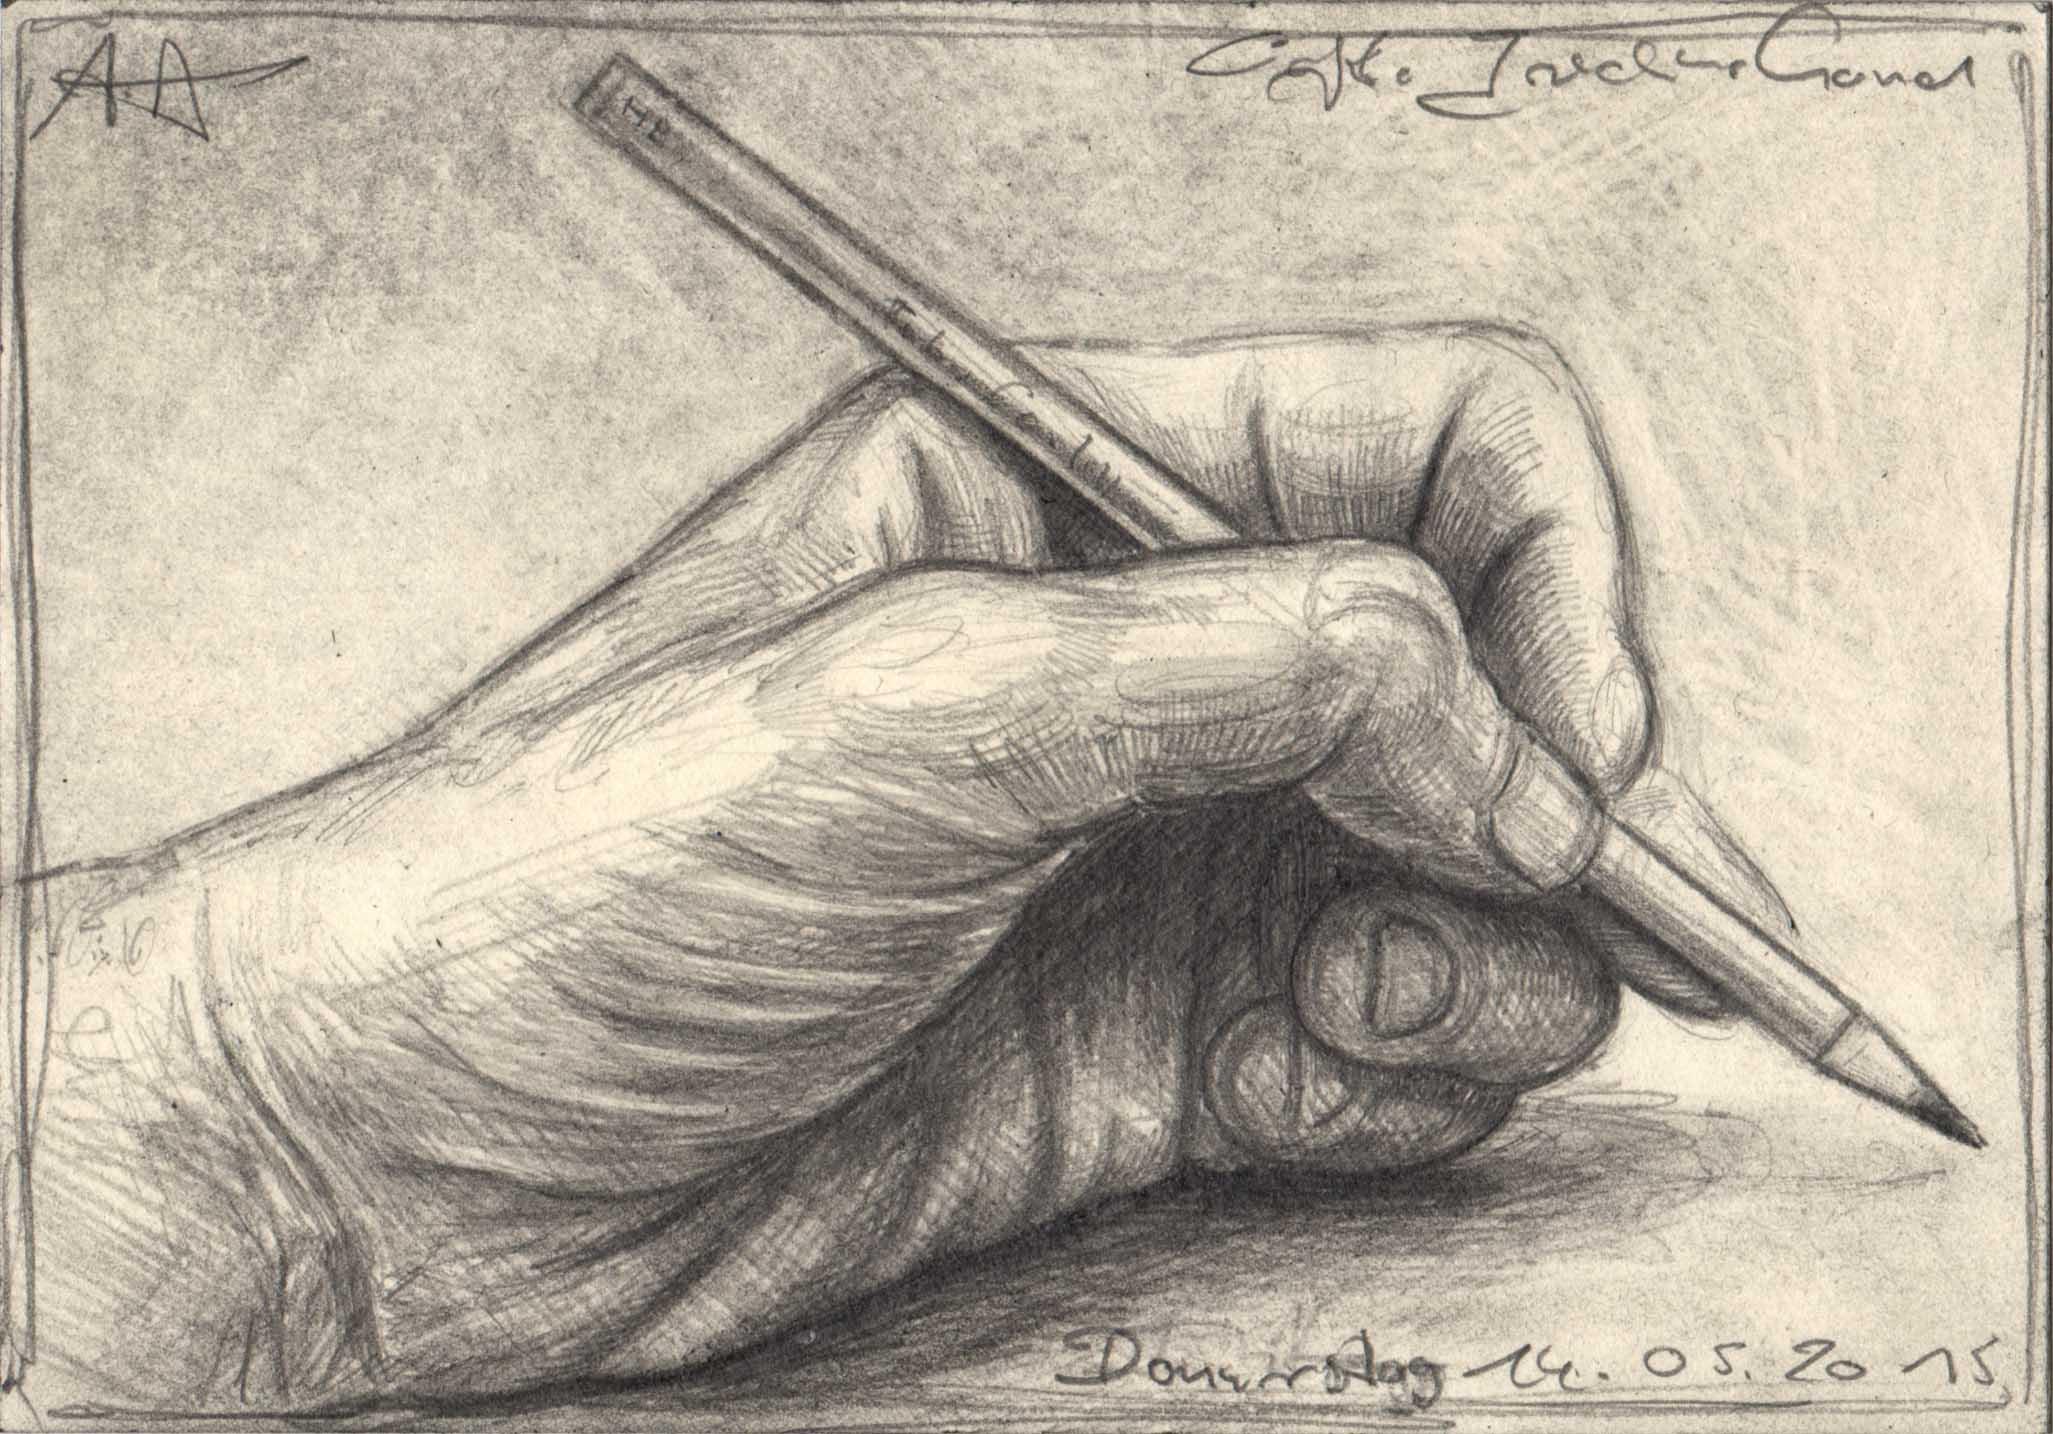 Artists left Hand